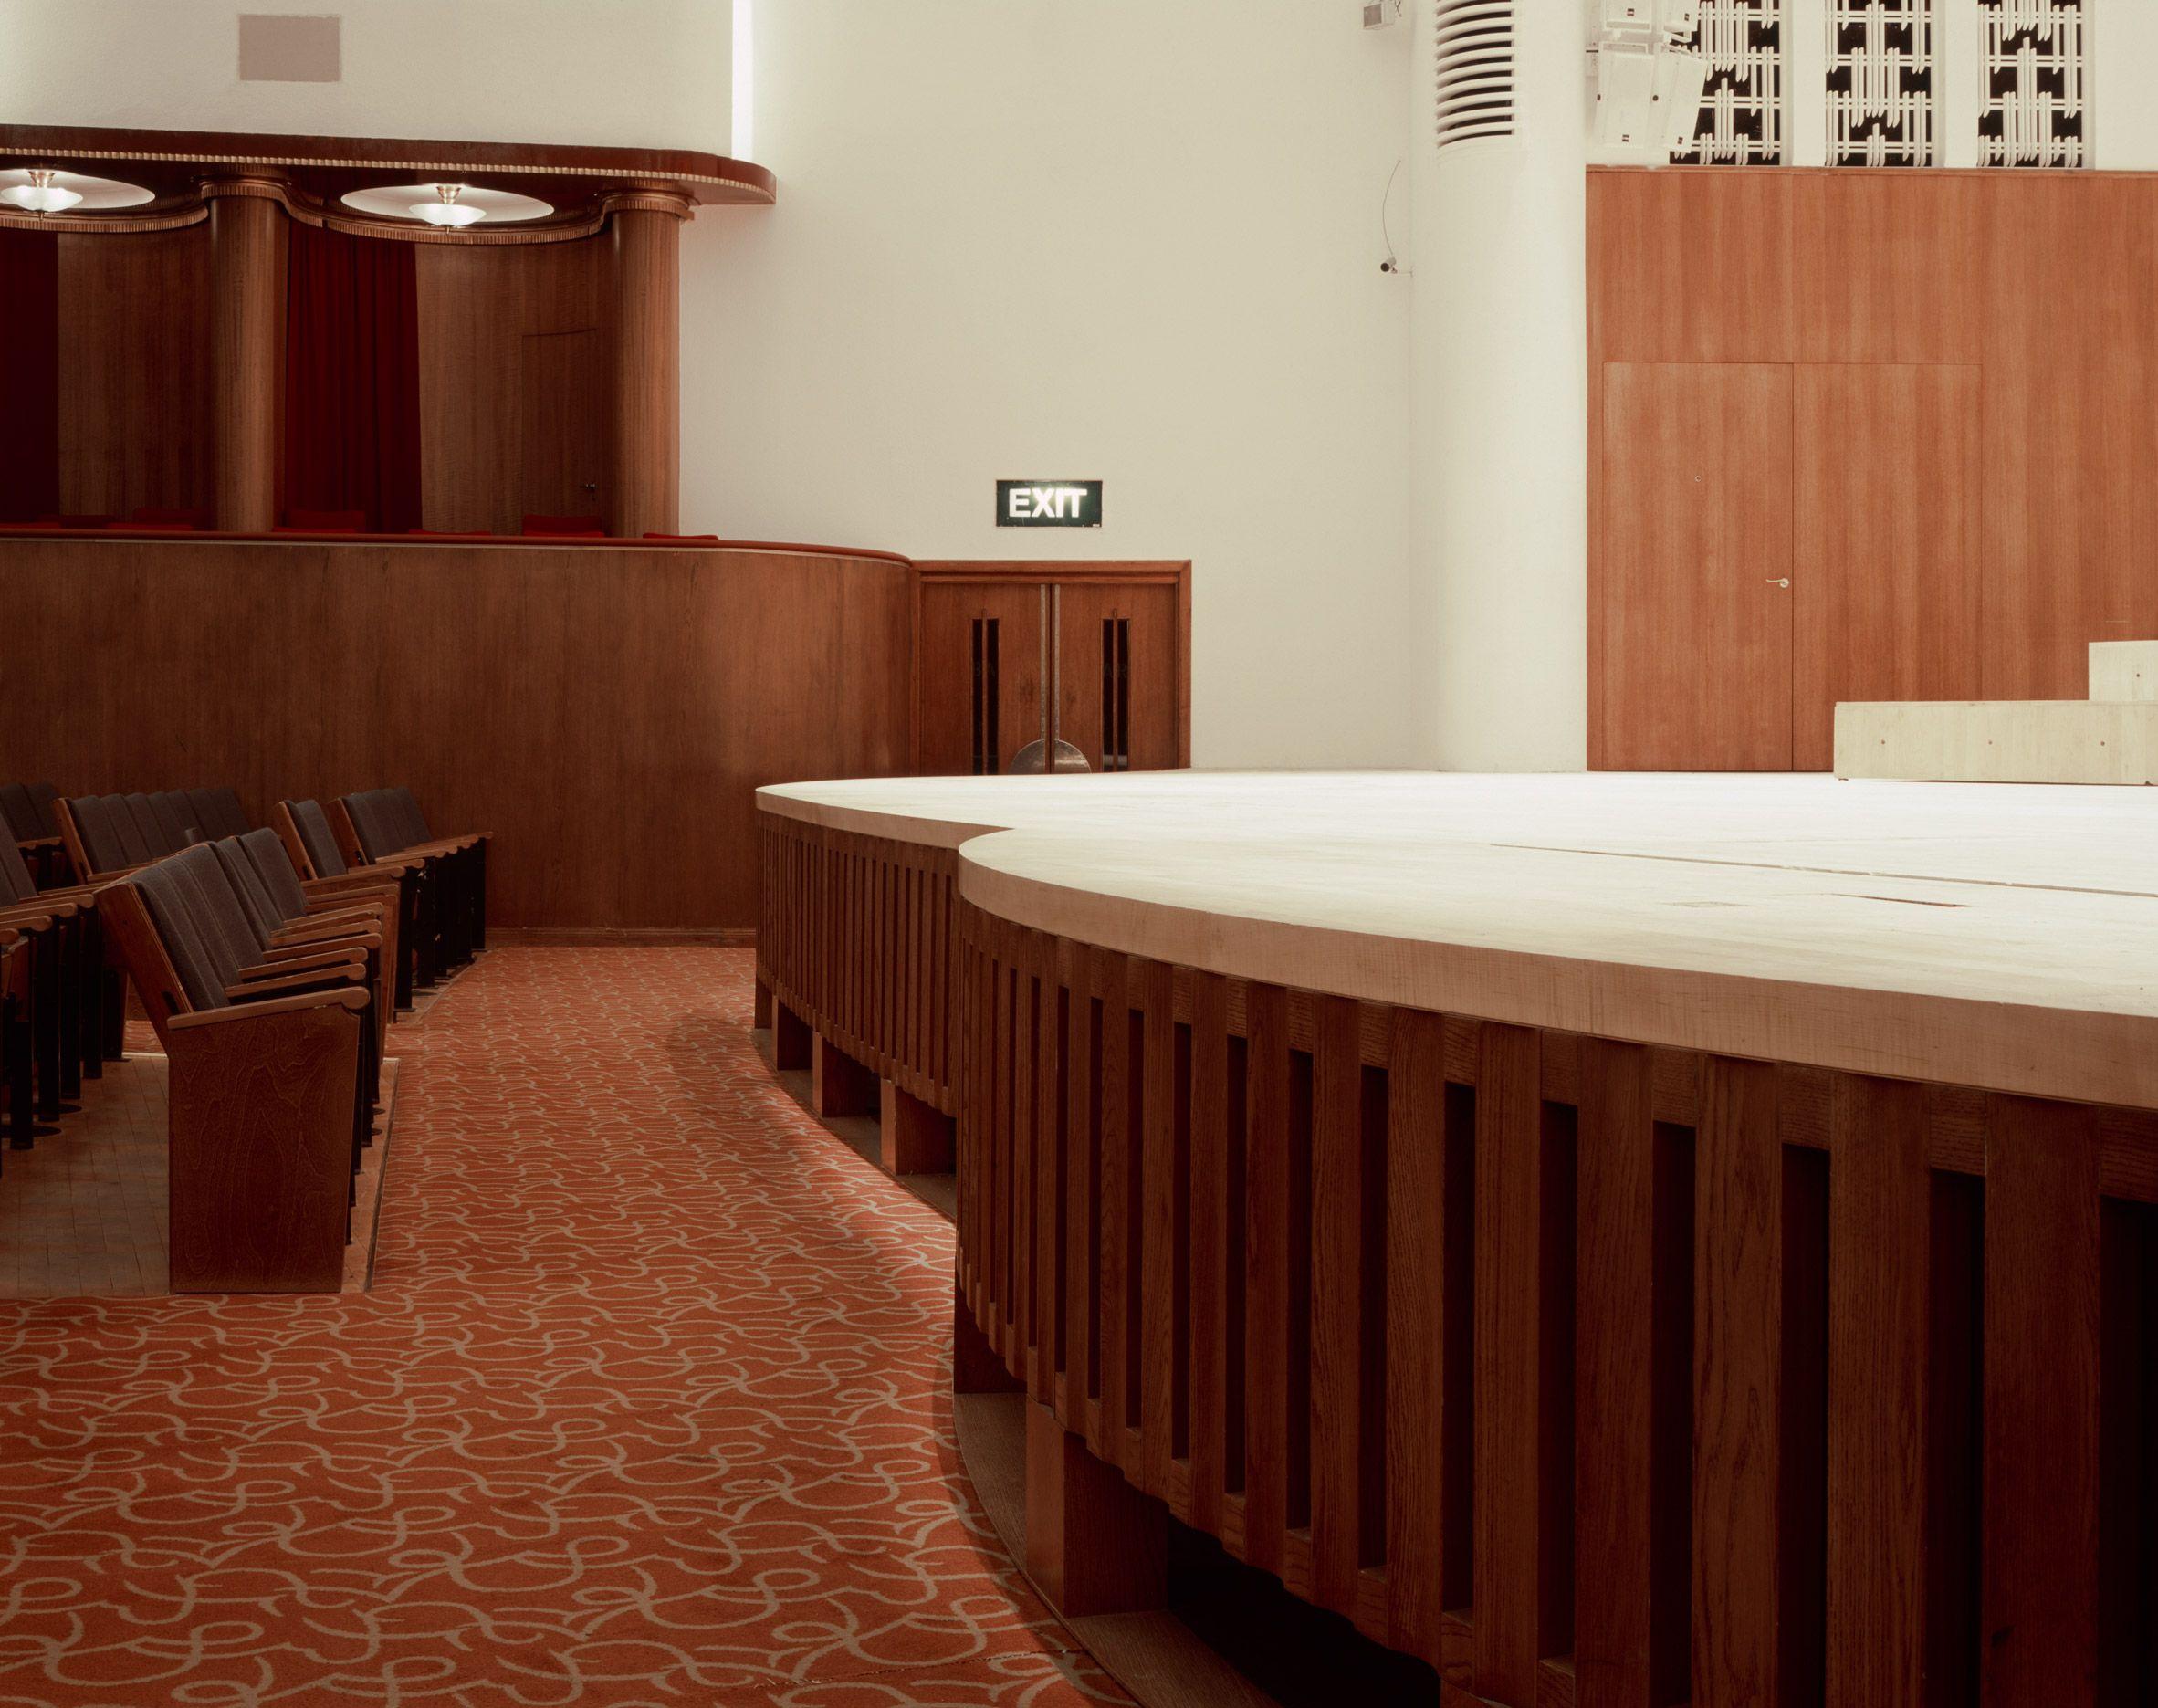 Liverpool Philharmonic Refurbishment By Caruso St John Interior  # Muebles Loverpool